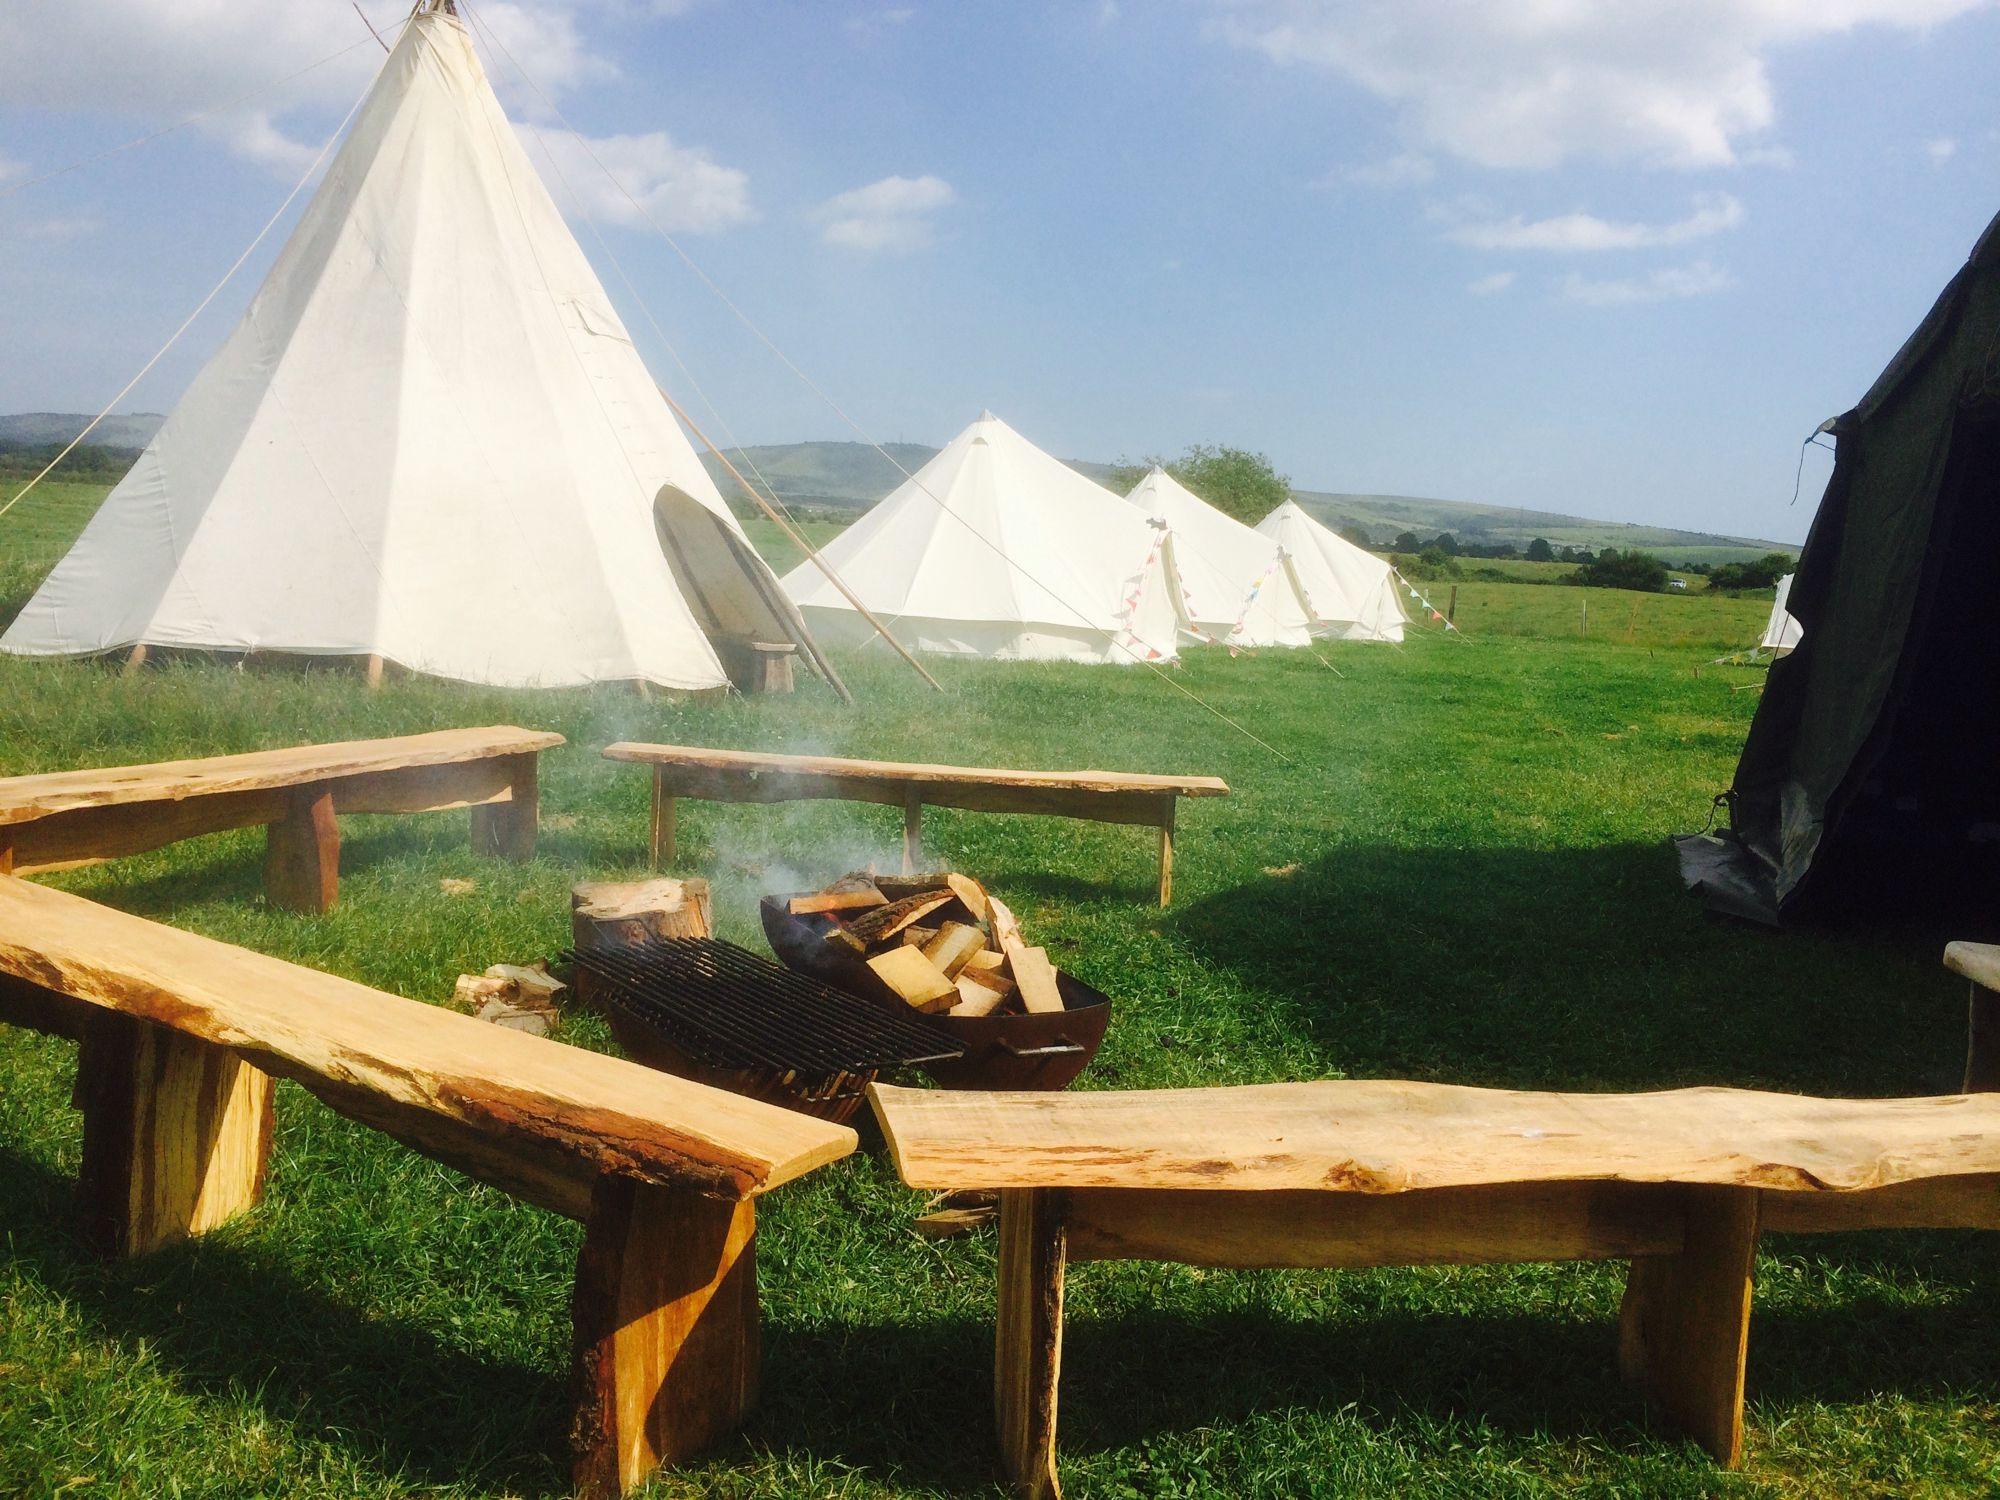 Glamping in Shoreham holidays at Cool Camping